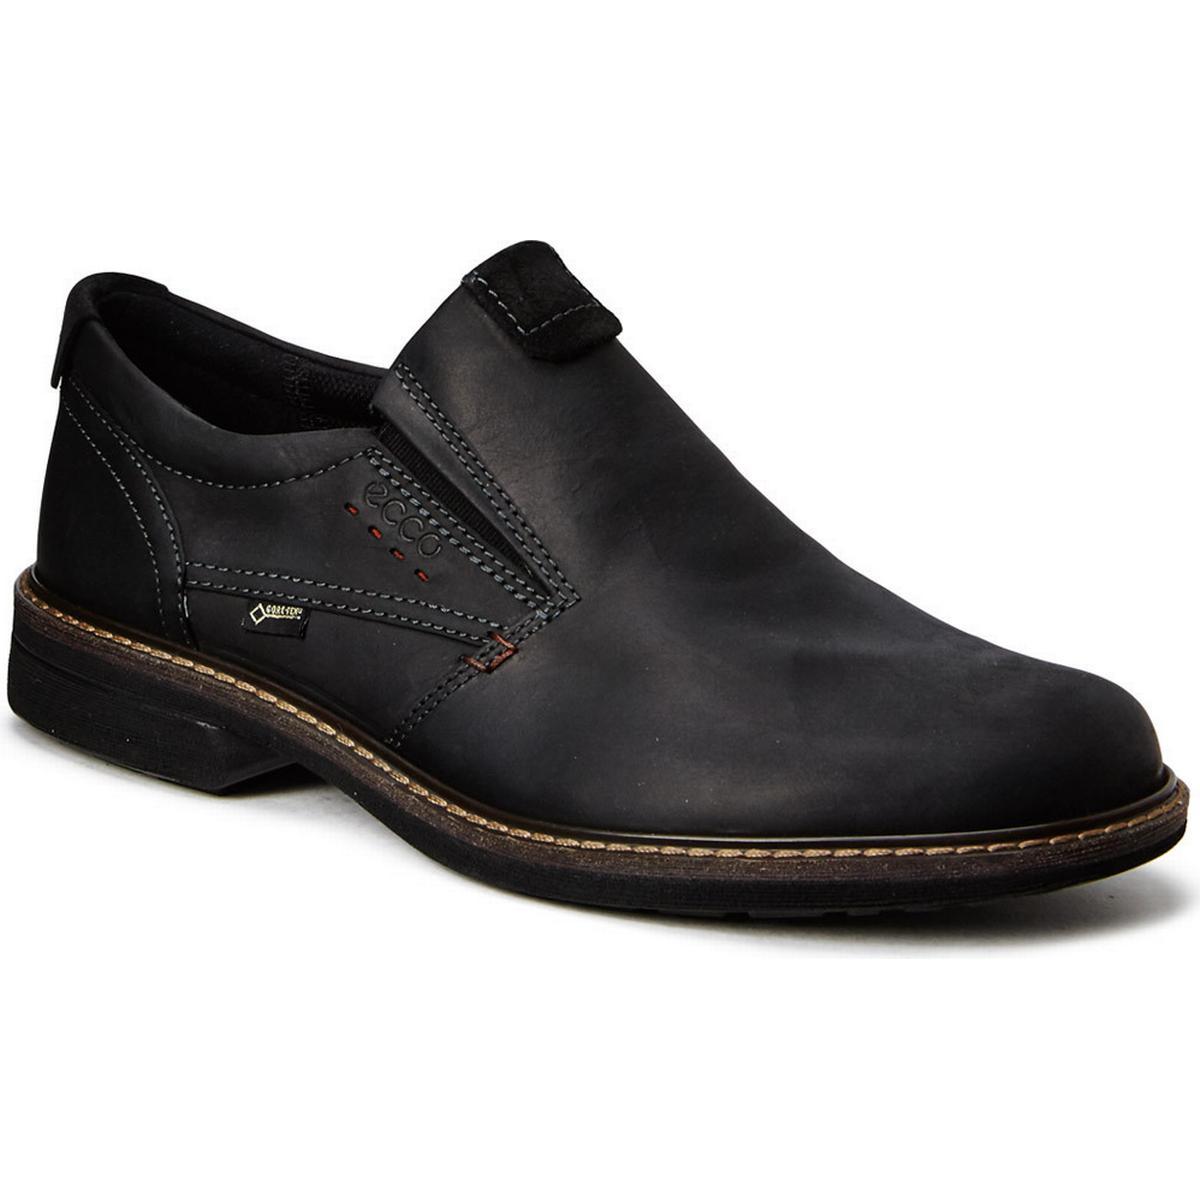 Ecco Felicia Slip on Ii (black Cow Leather) Women's Slip On Shoes